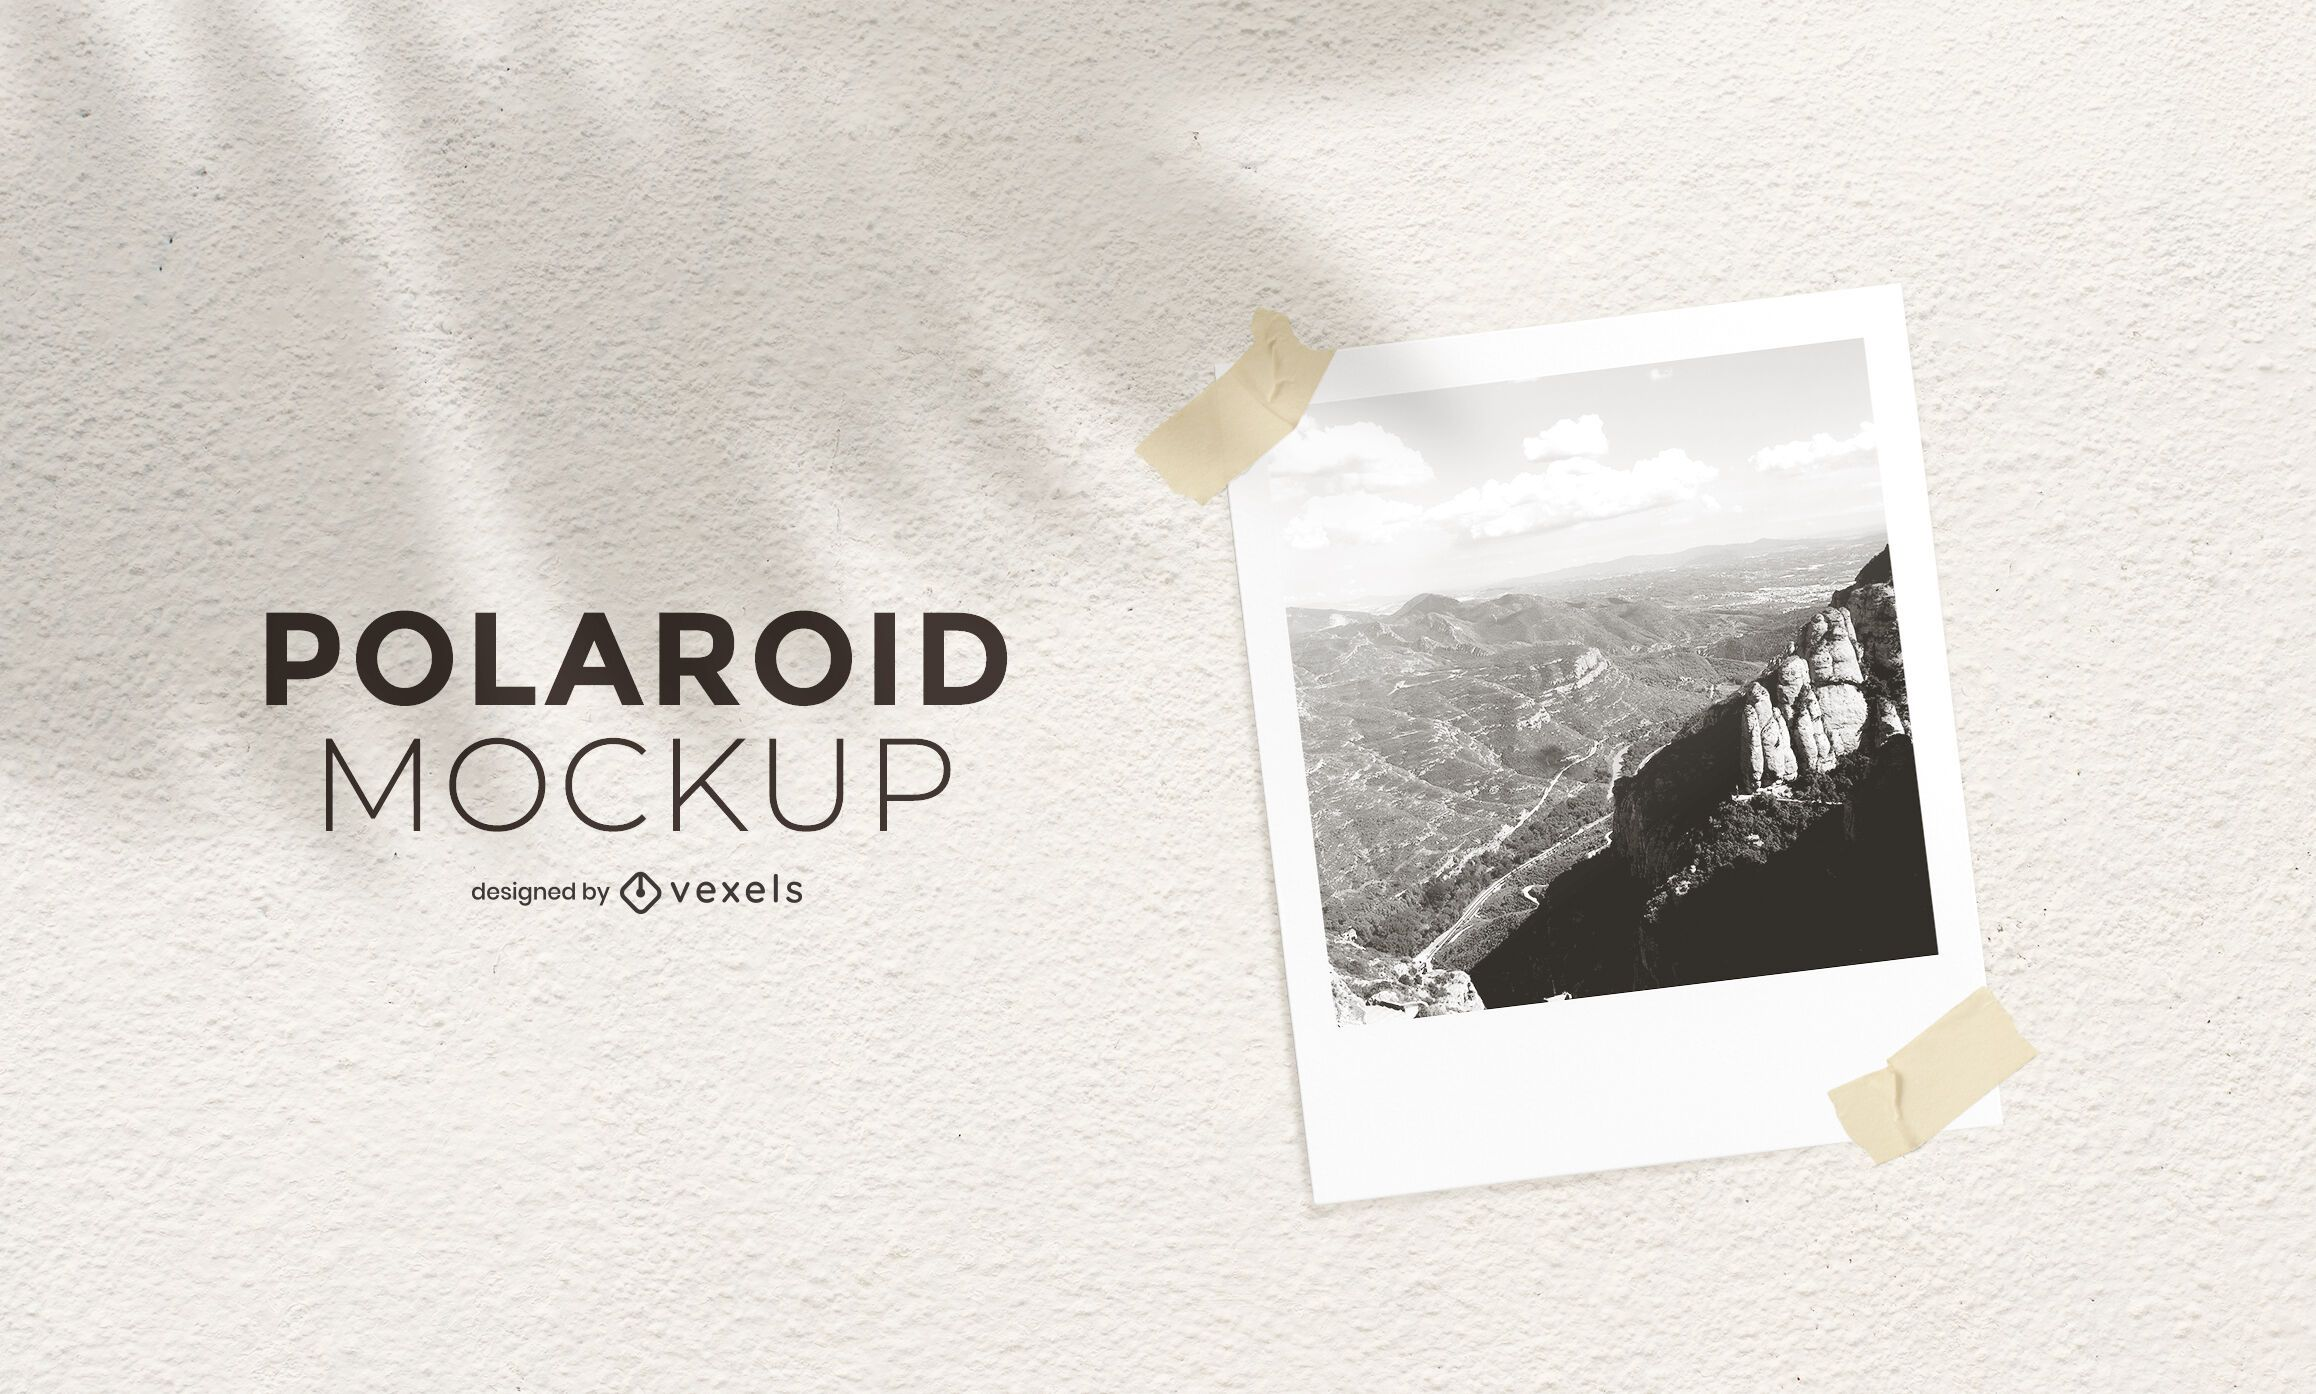 Polaroid photograph mockup design